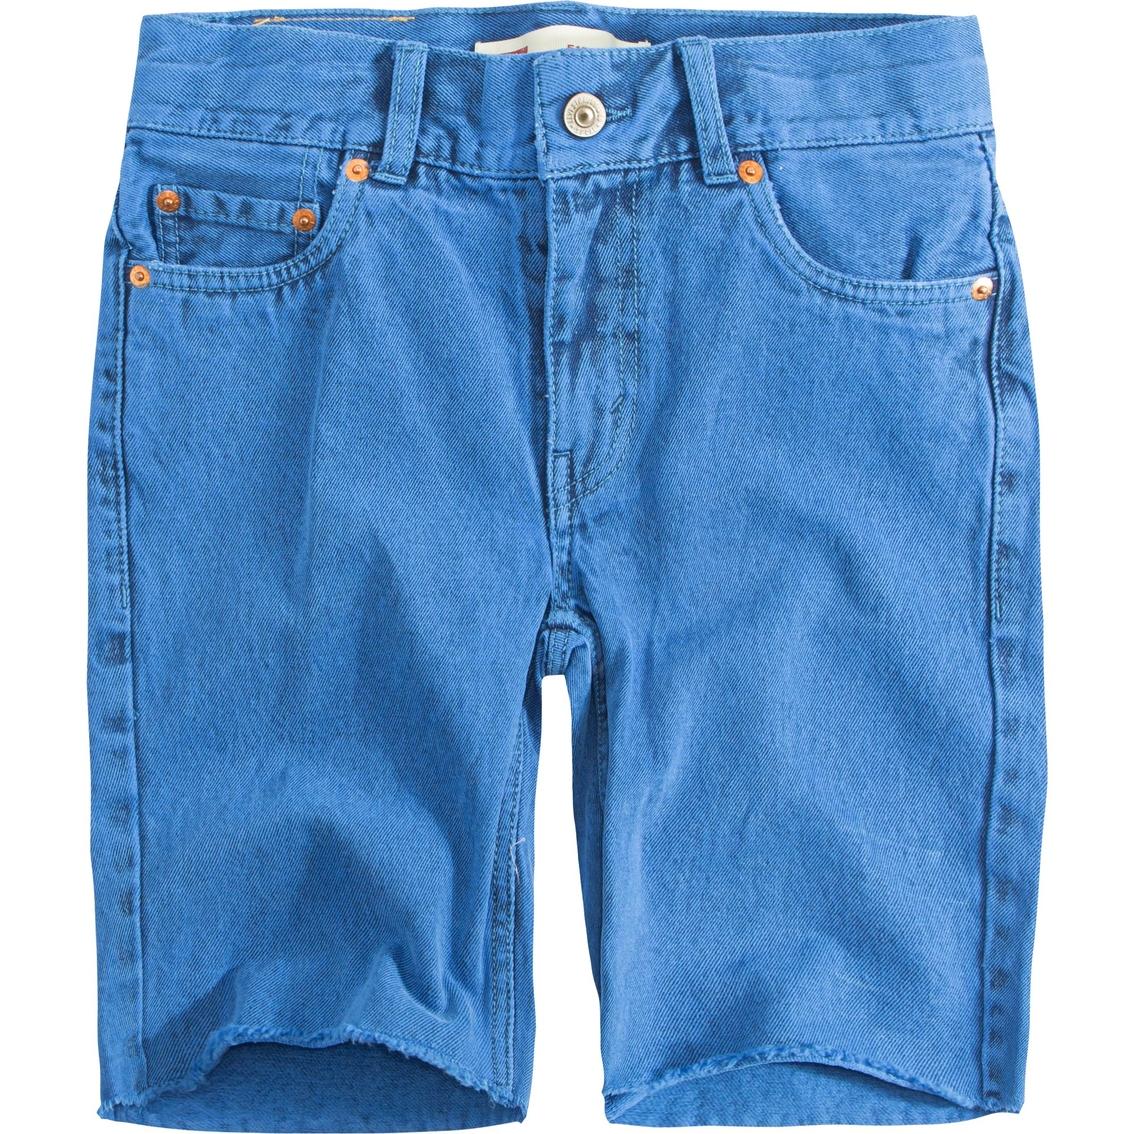 443b038415 Levi's Little Boys 511 Slim Fit Overdyed Shorts   Boys 4-7x ...